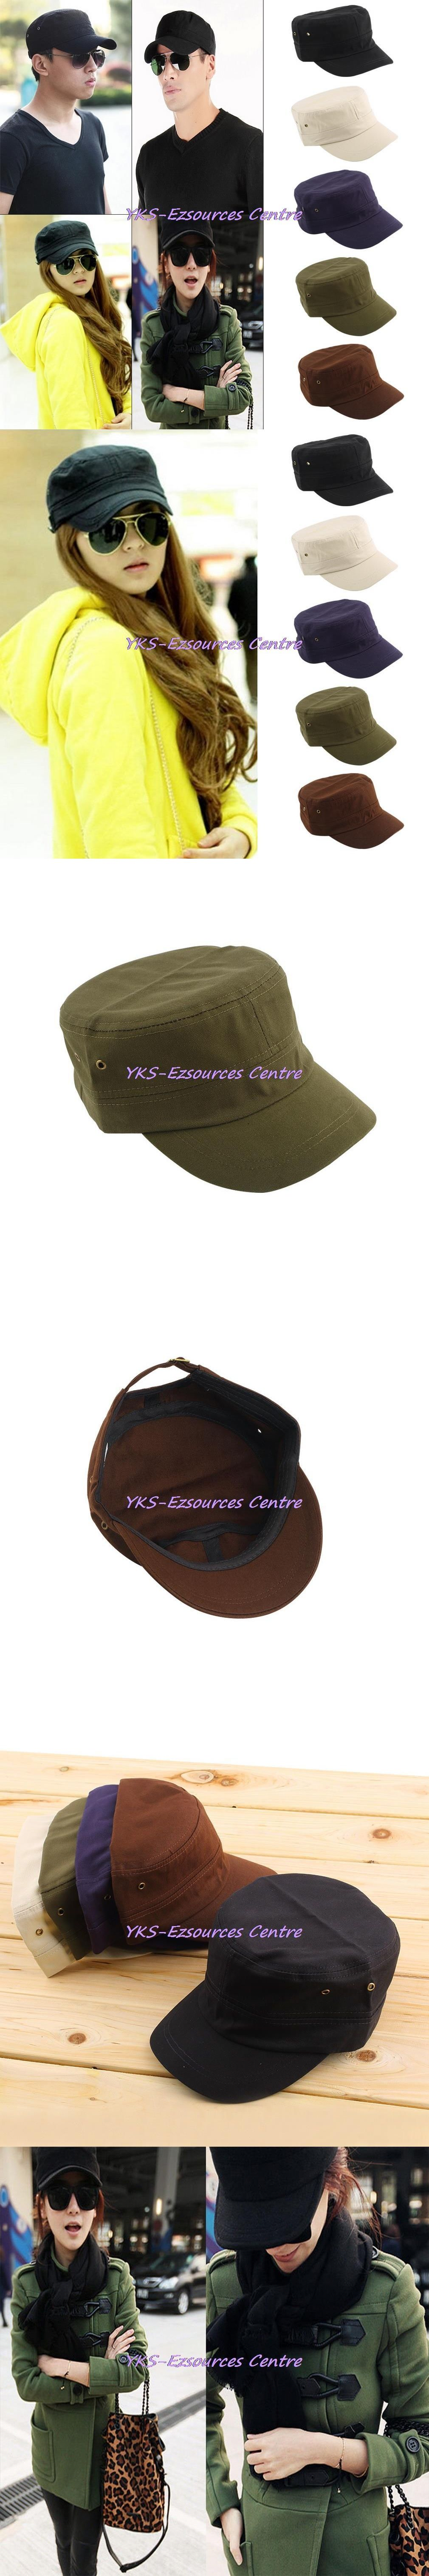 6669e43f23c 2017 Men Women Casual Baseball Cap Classic Hat Preppy Style Adjustable Army  Plain Vintage Hat Cadet